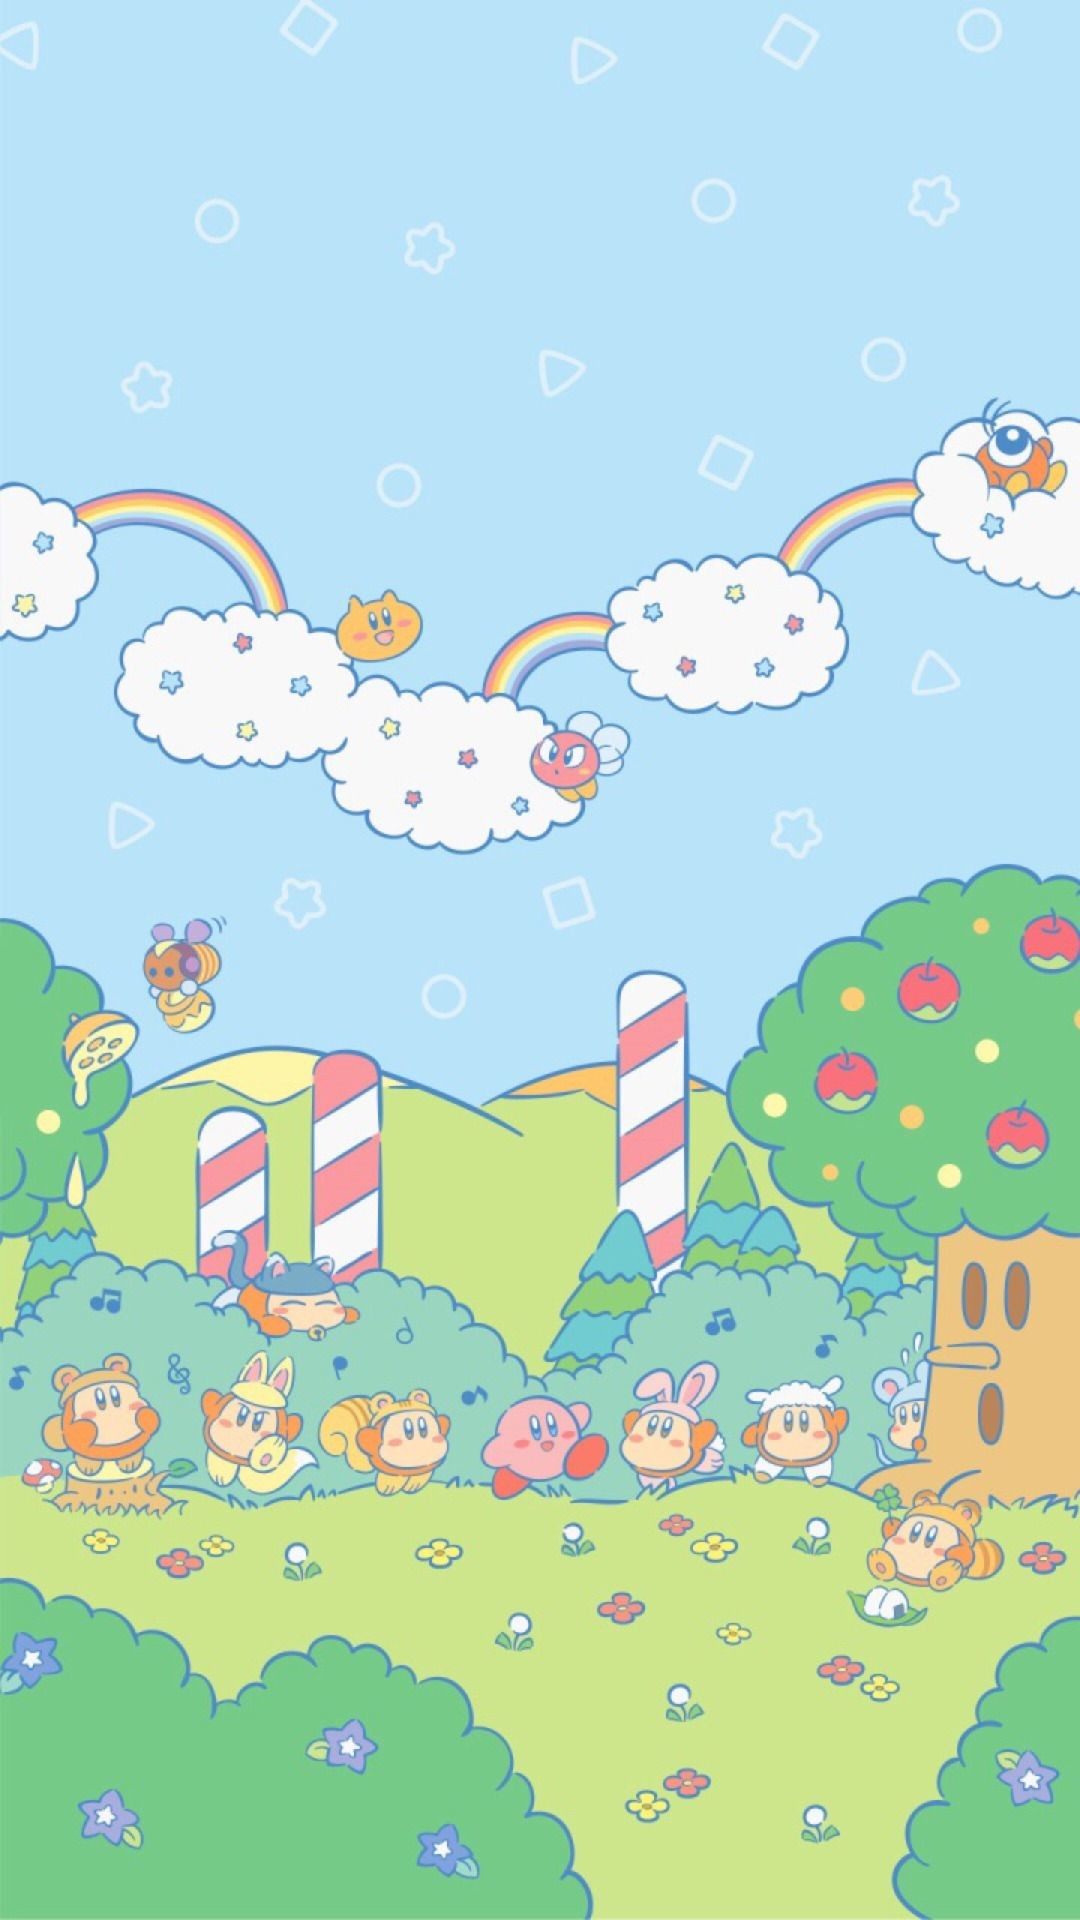 Cute Nintendo Phone Wallpaper